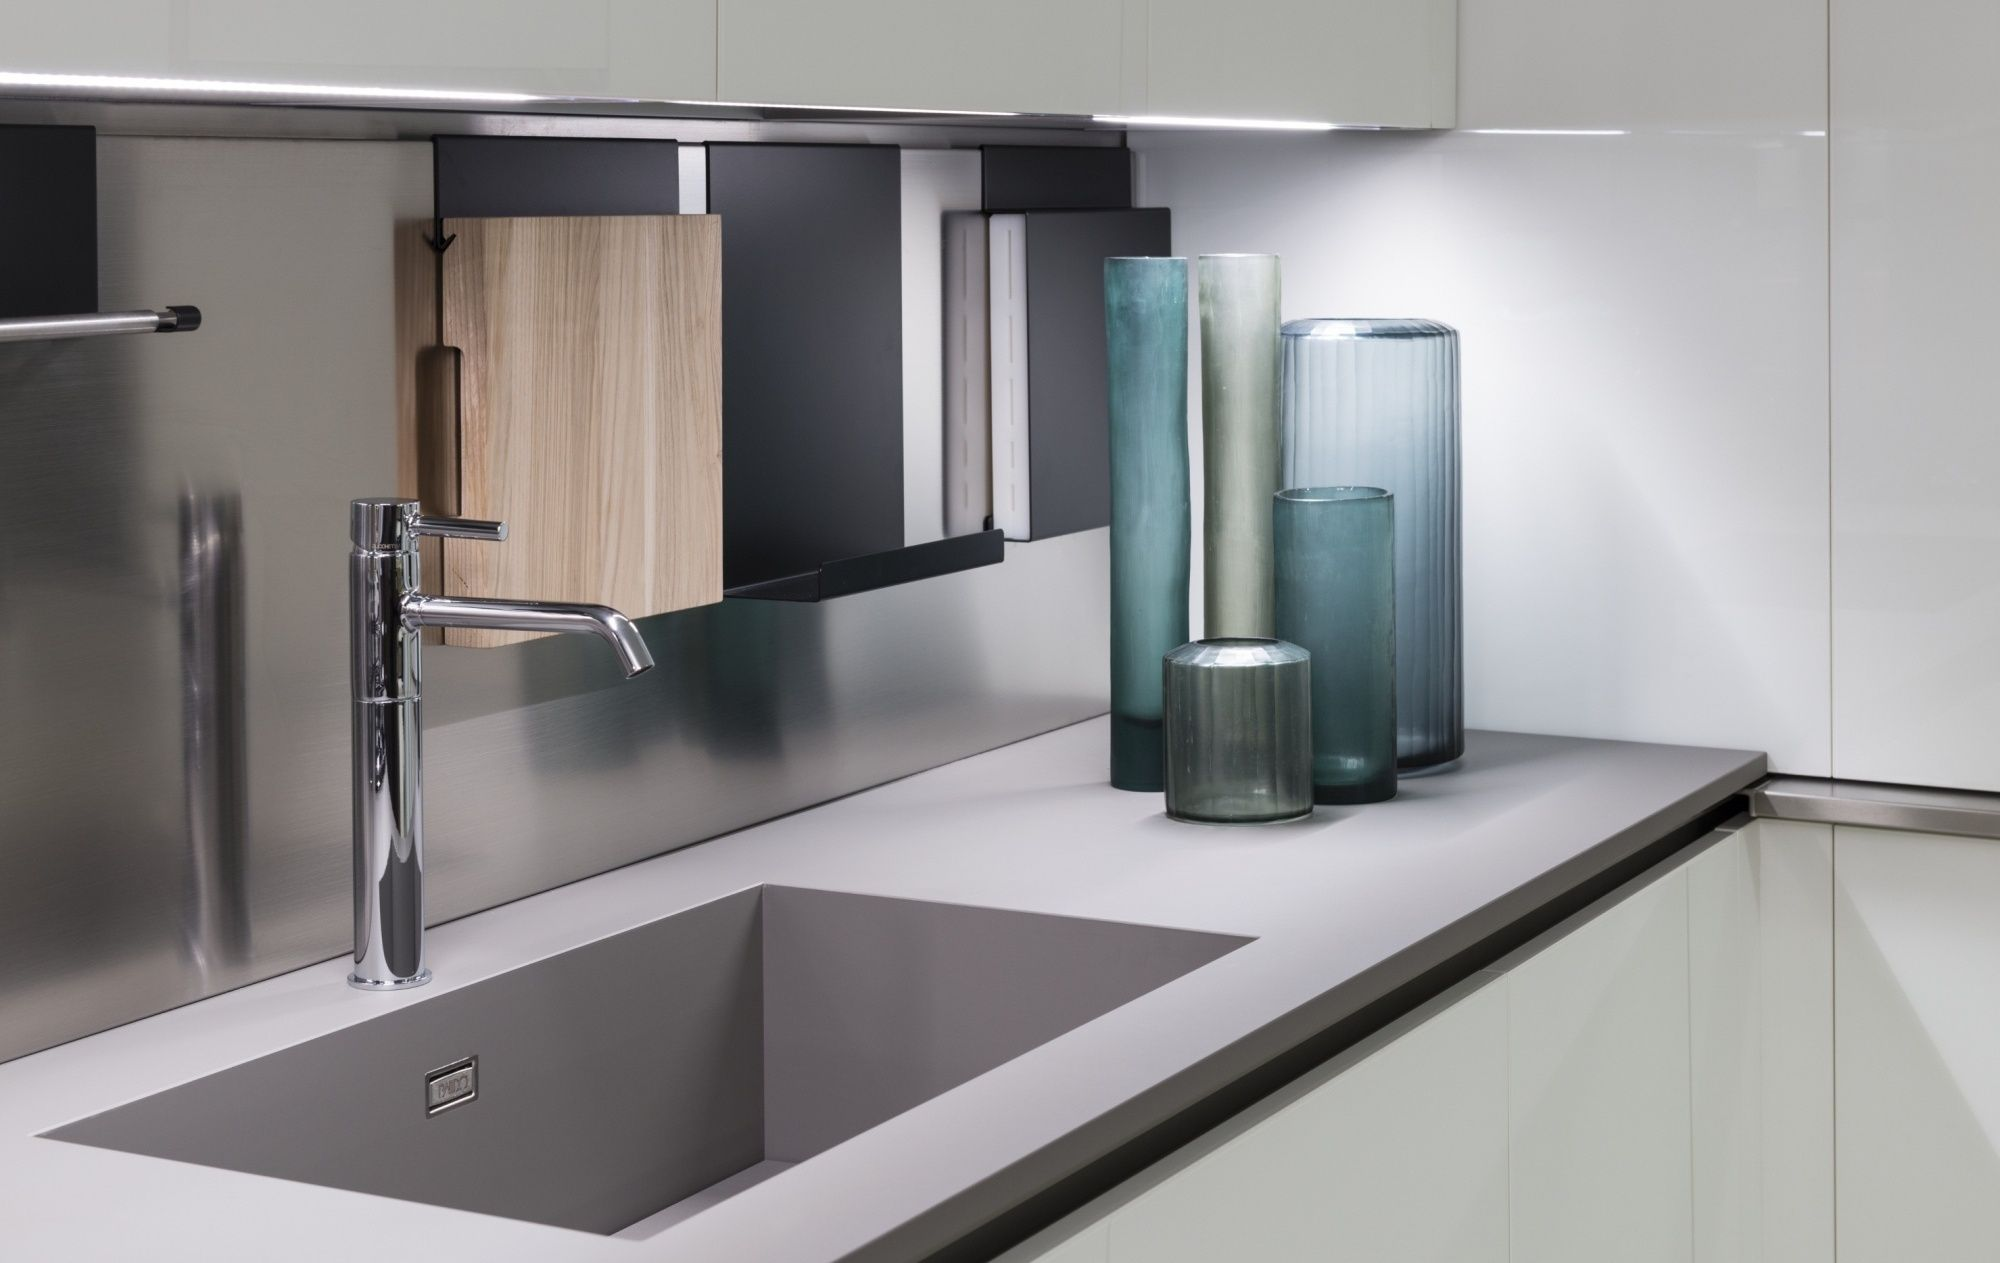 Fenix Ntm Case Histories Furniture And Interior Design Fenix